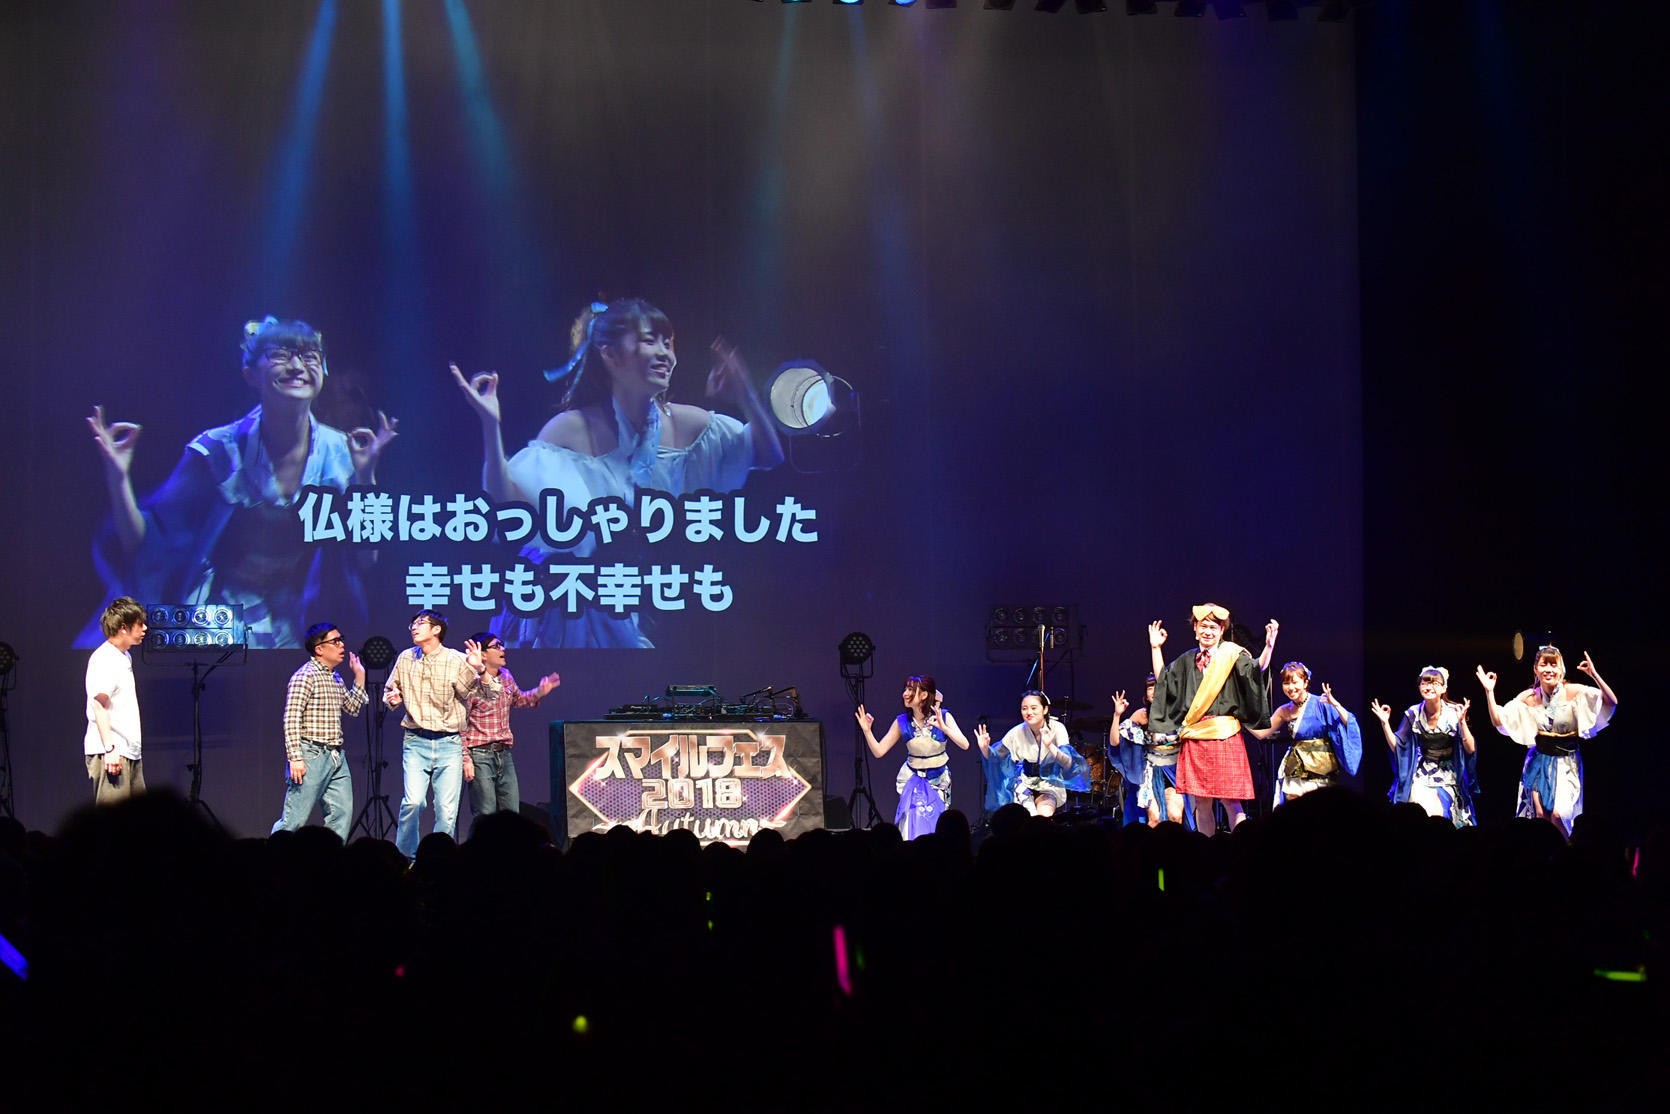 http://news.yoshimoto.co.jp/20181201025627-abda1a06a510e4a4e616156806053e9876073317.jpg